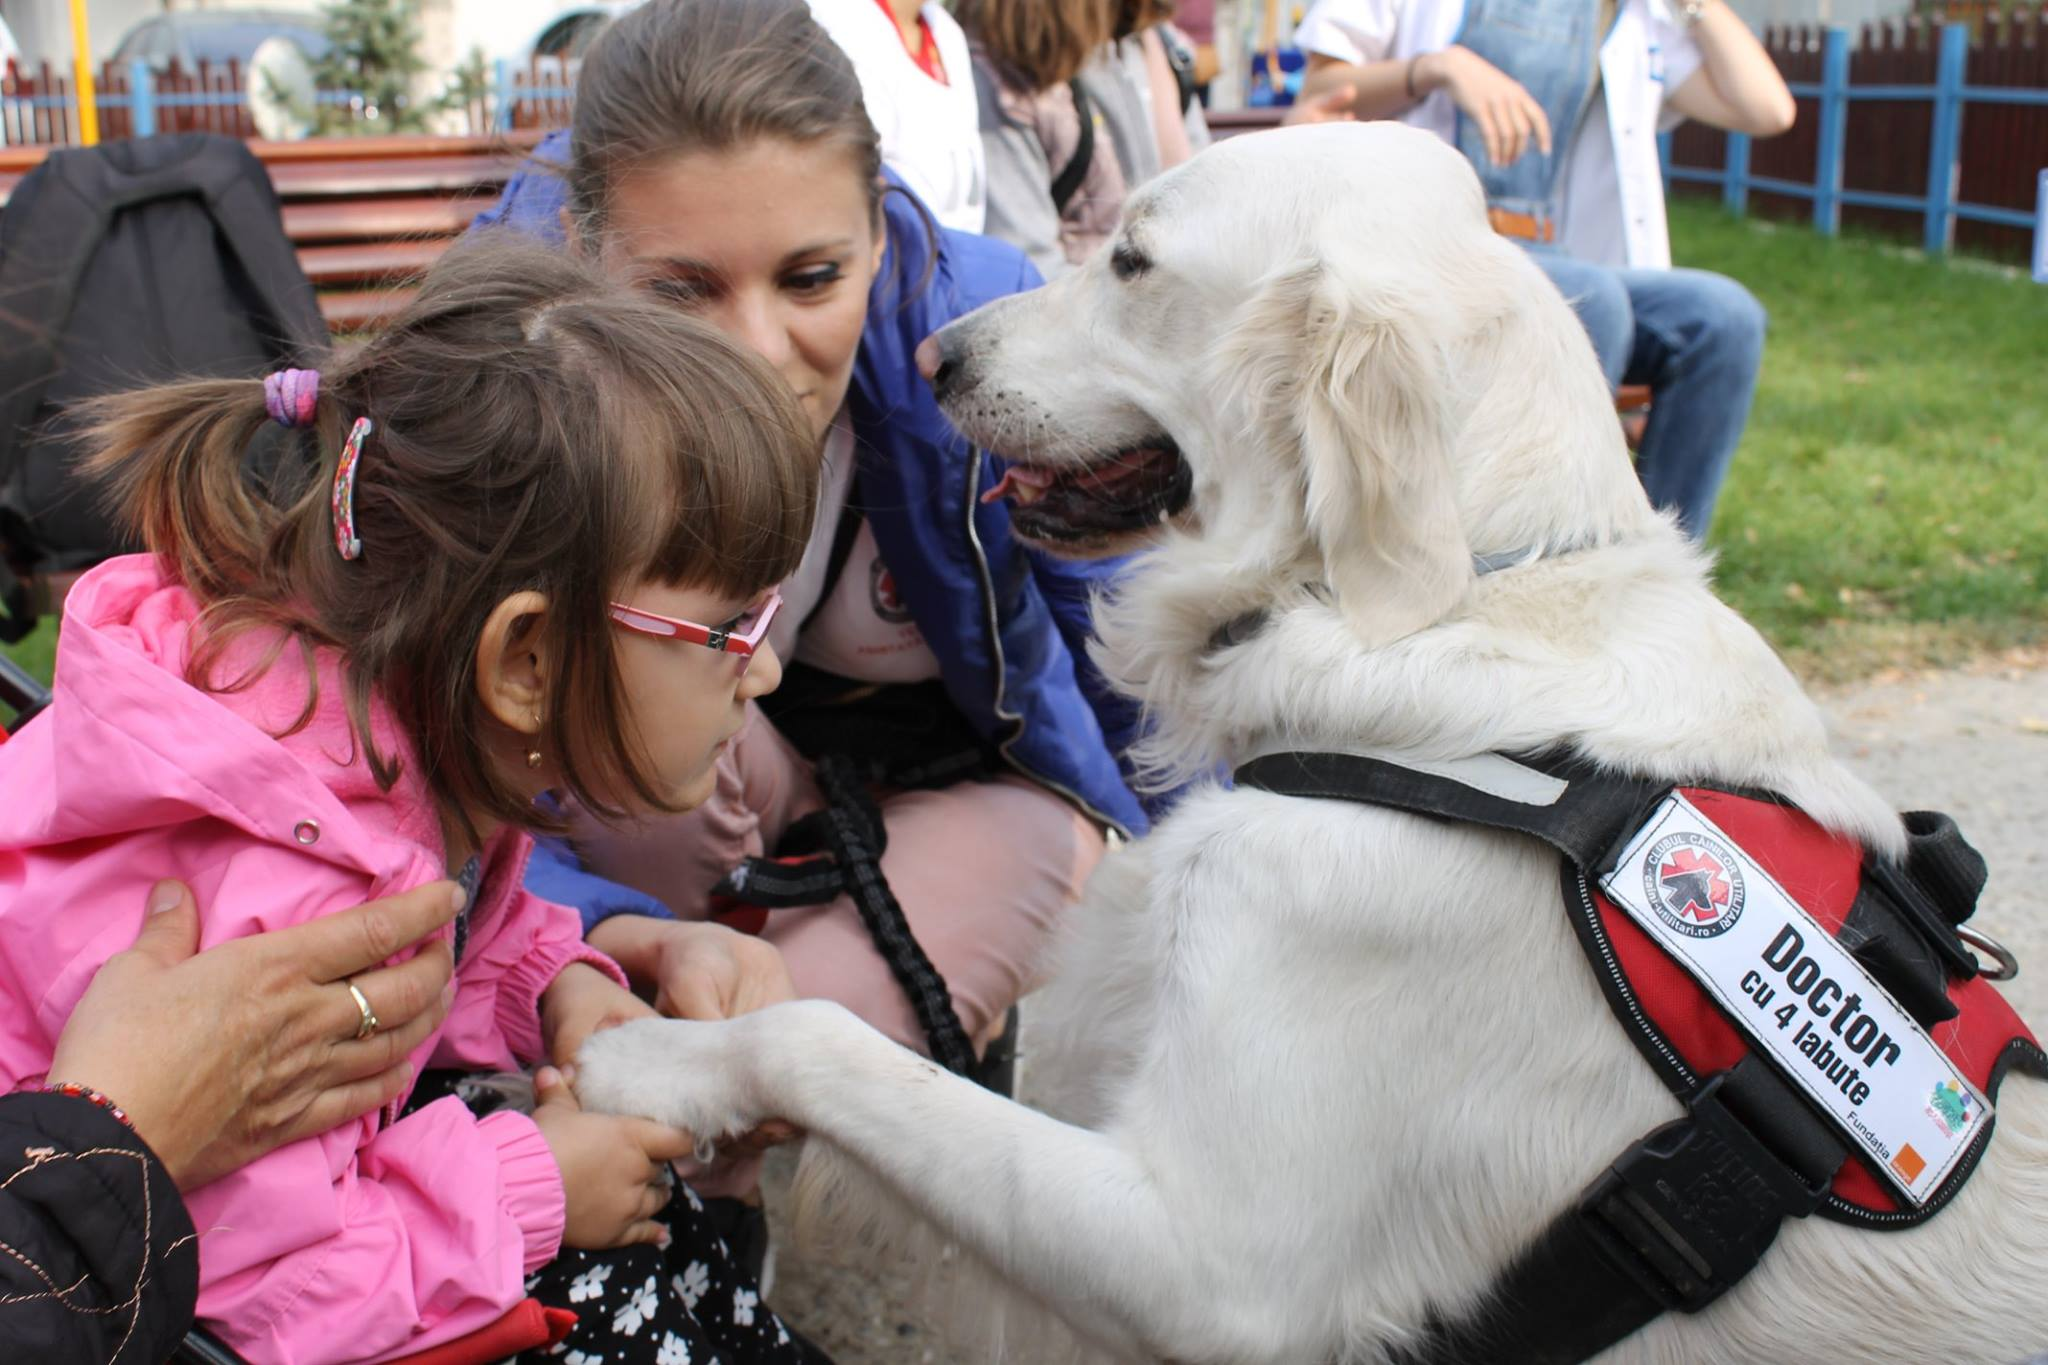 Terapia cu animale, o metoda inedita de terapie pentru copii È™i seniori